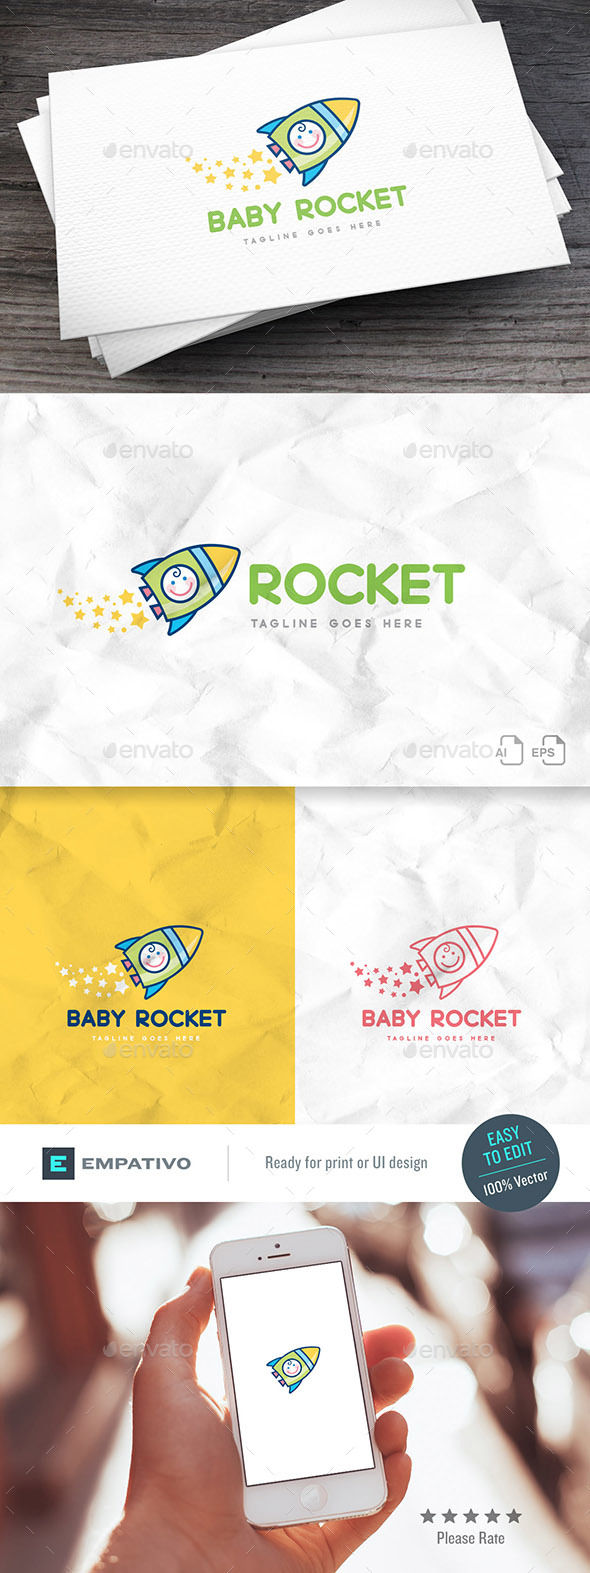 Baby Rocket Logo Template